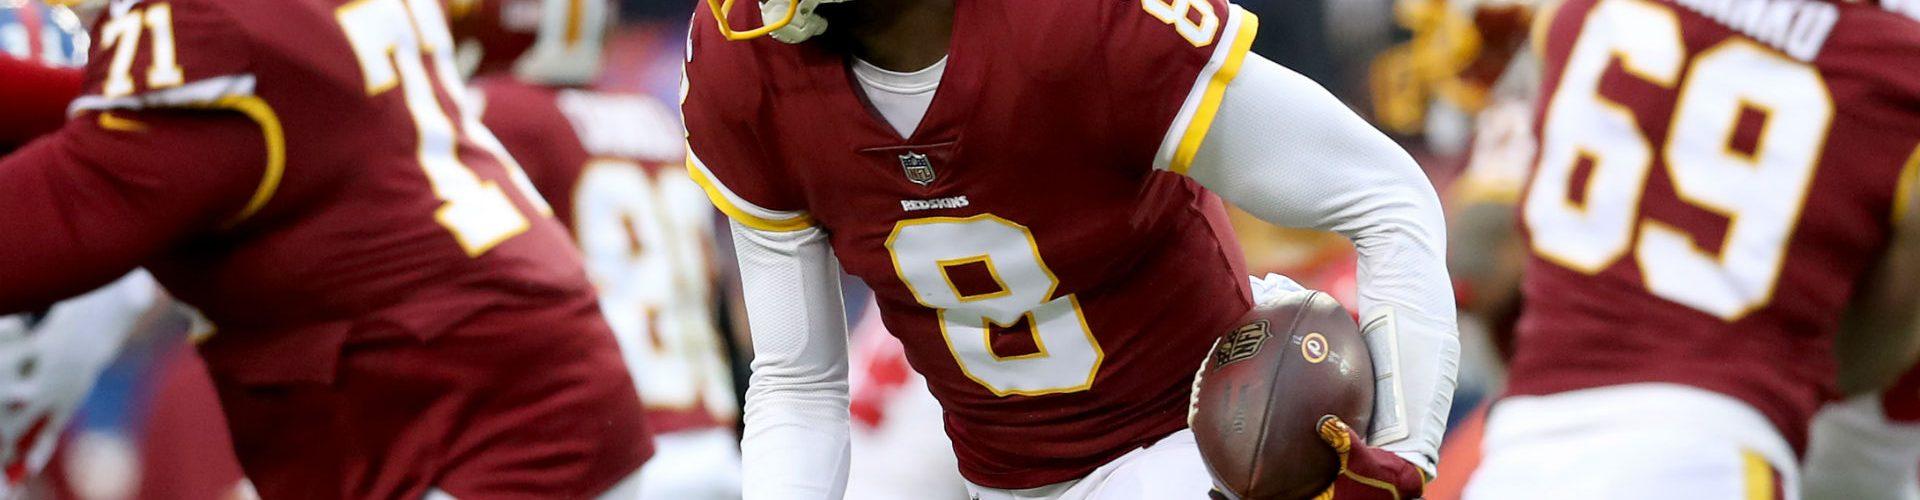 Josh Johnson Joins 13th NFL Team After Tom Savage Injury